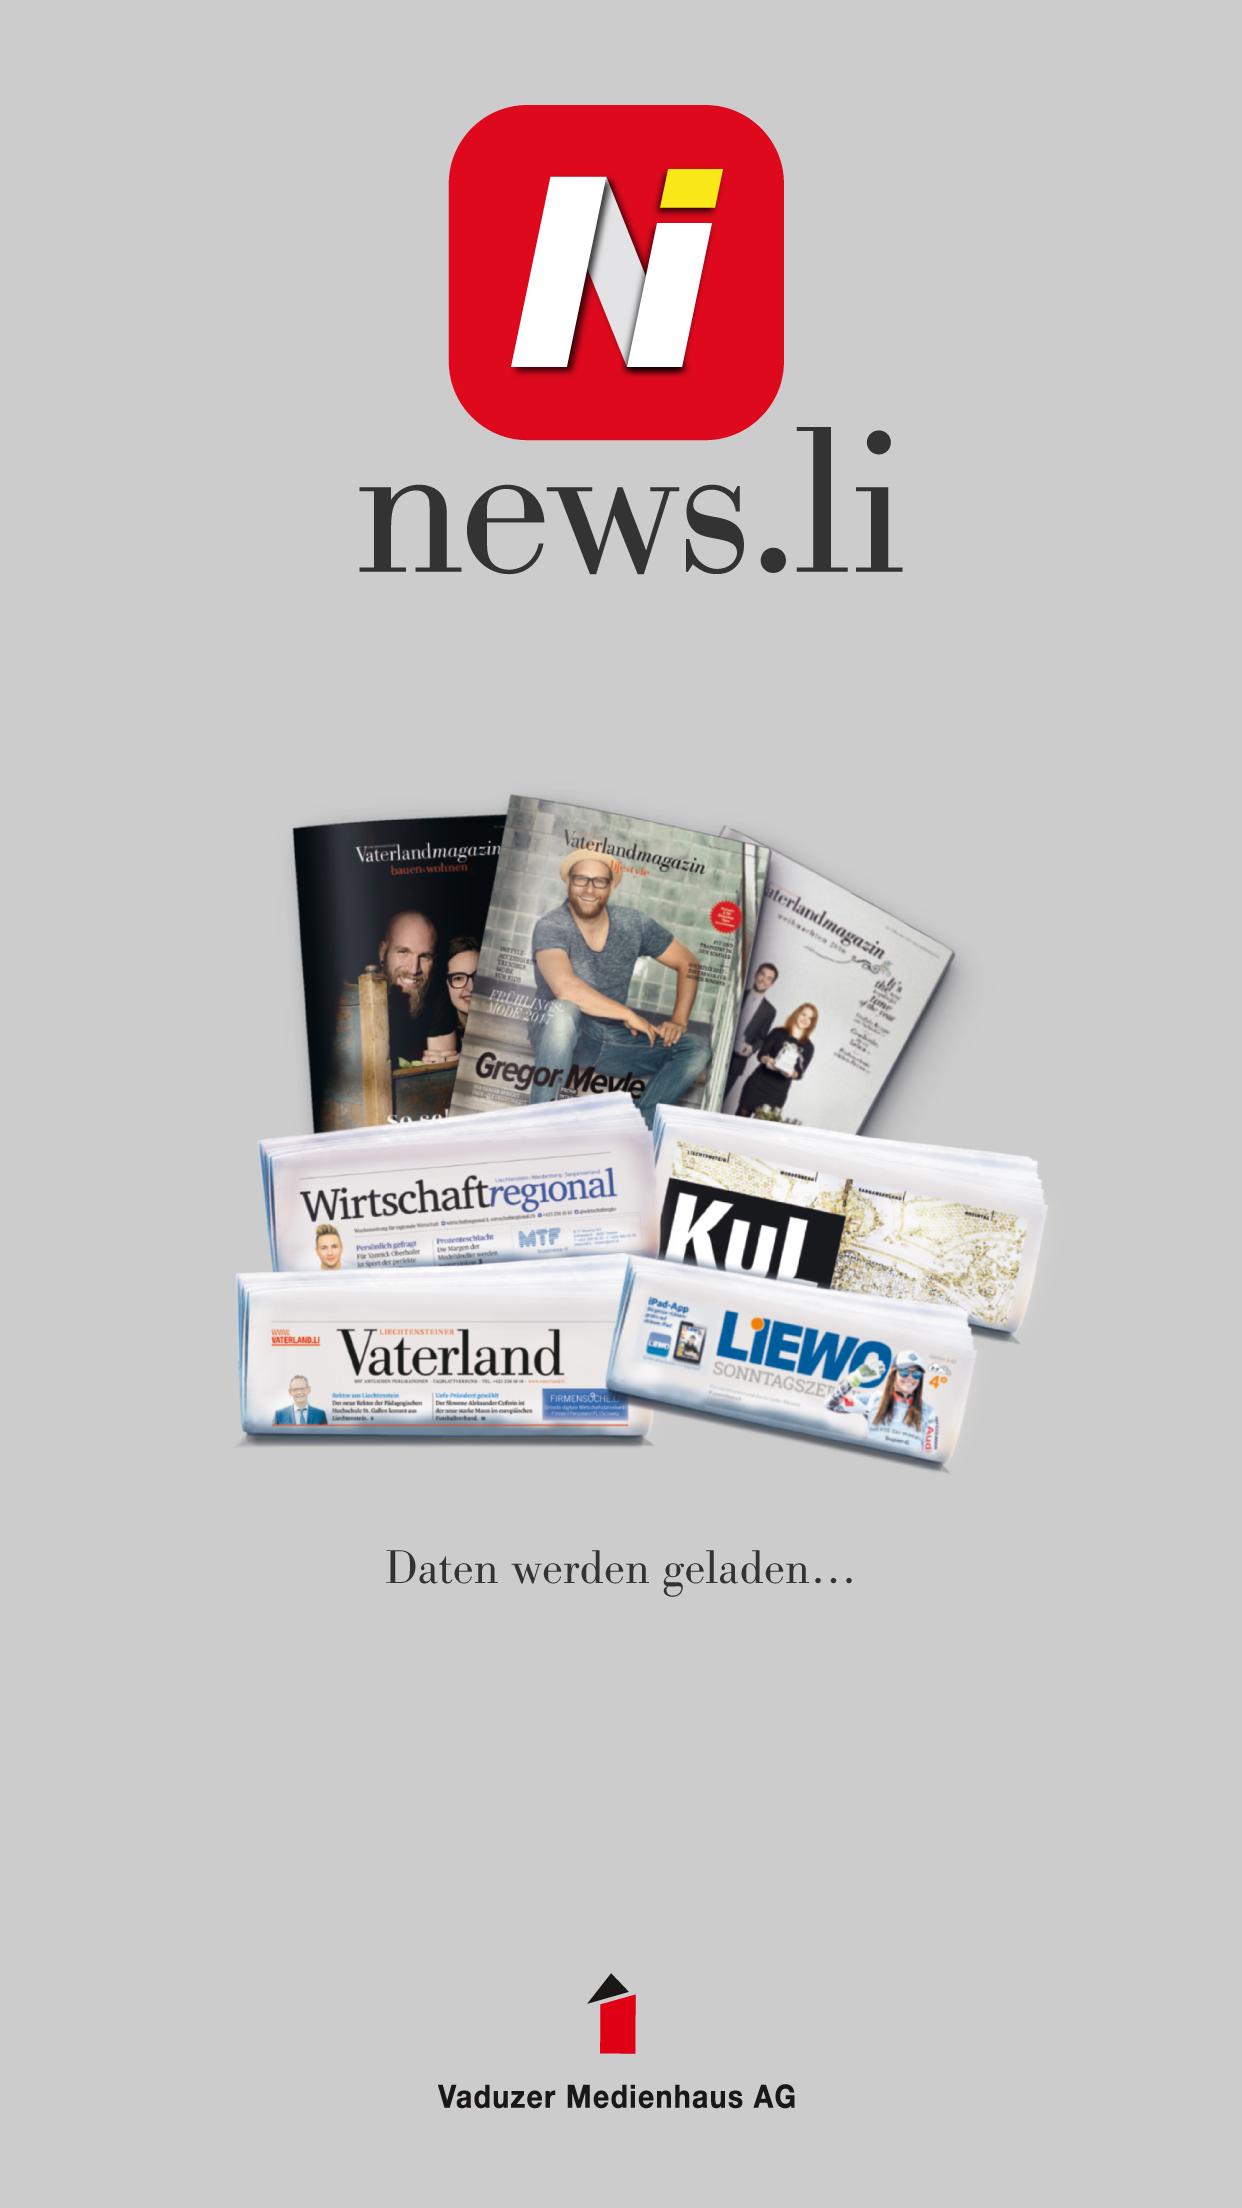 News.li